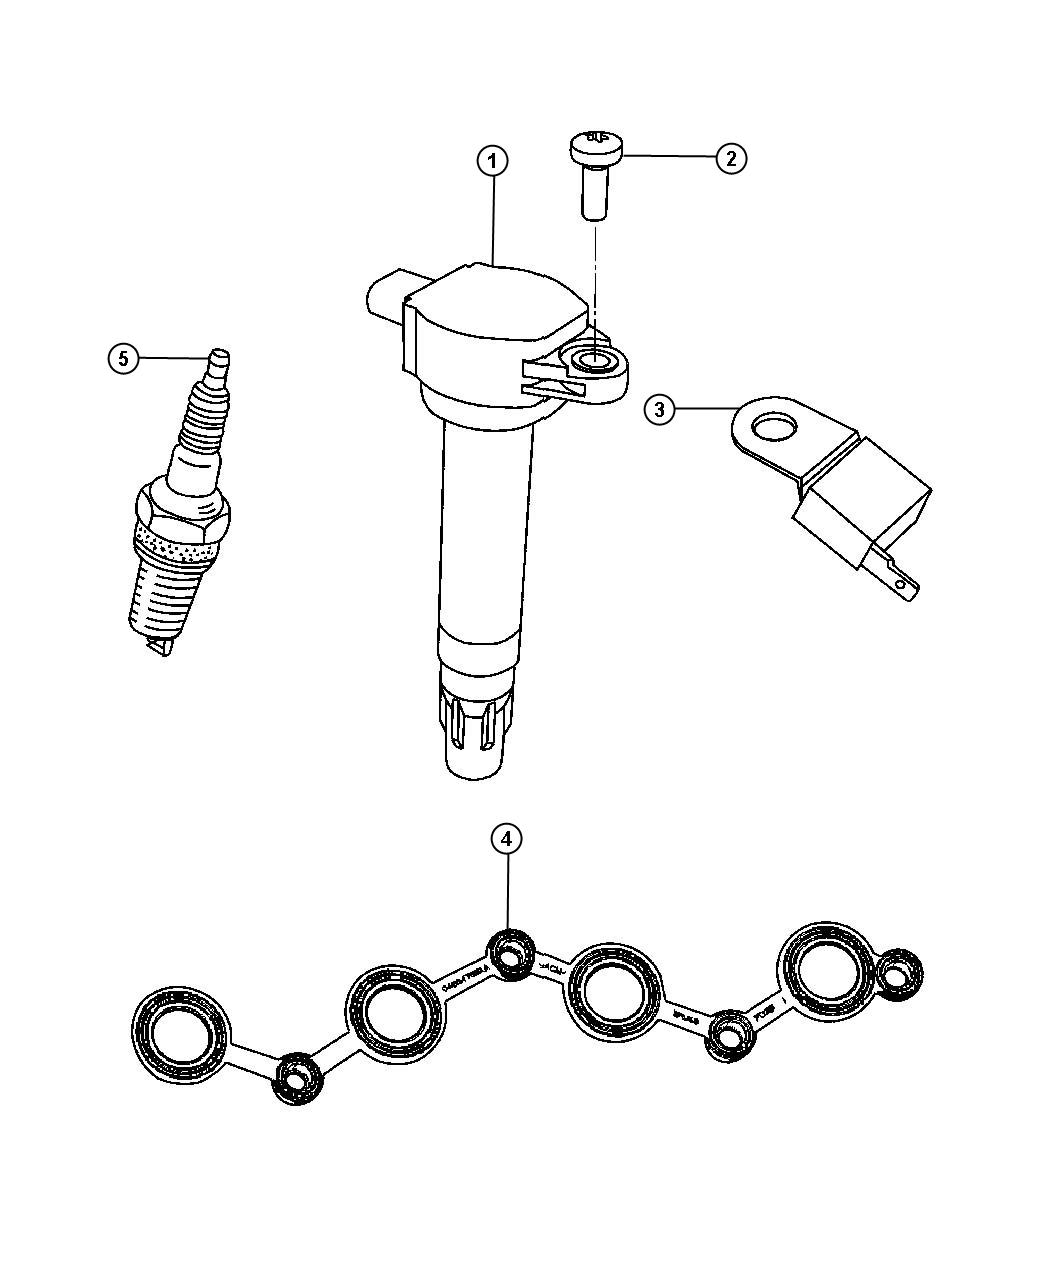 2010 Dodge Caliber Coil. Ignition. Spark, plugs, module